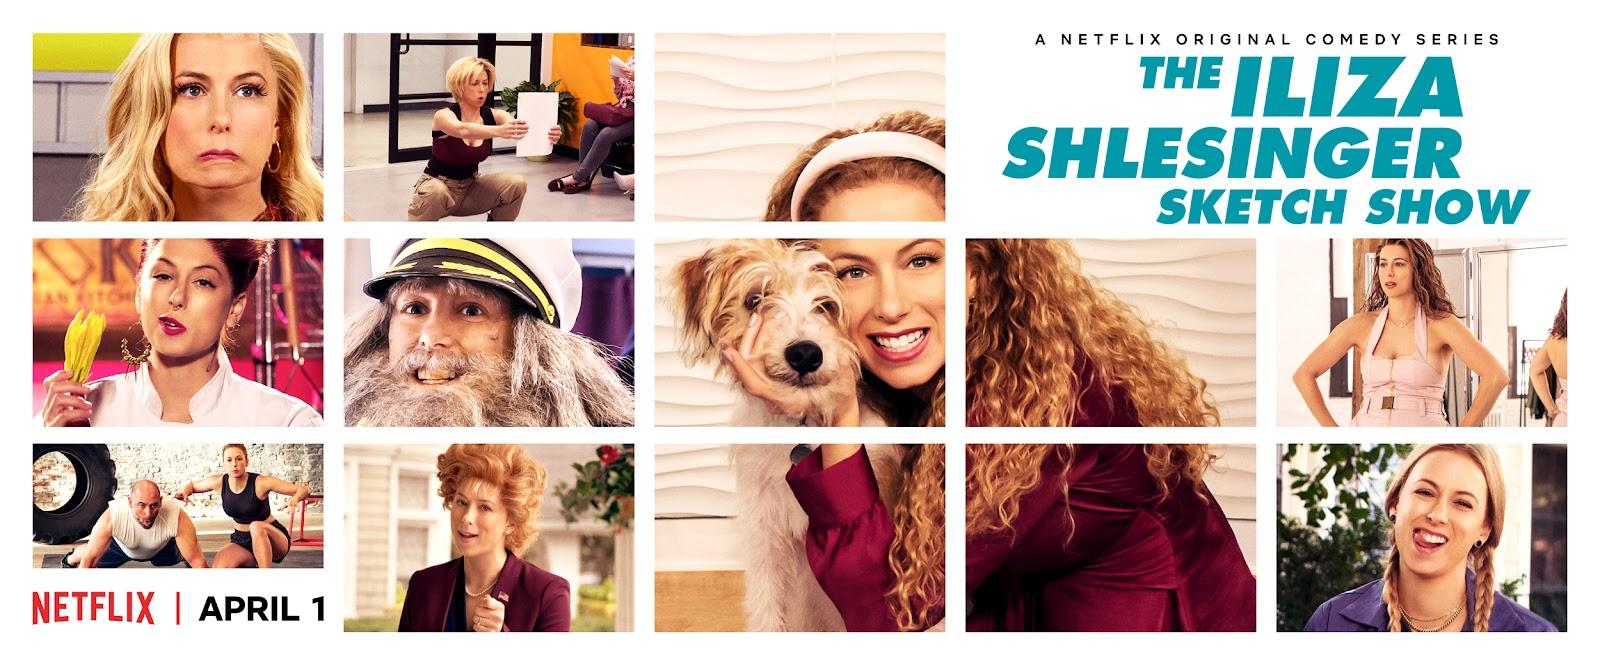 Netflix Debuts Trailer for the Iliza Shlesinger Sketch Show - Image 1